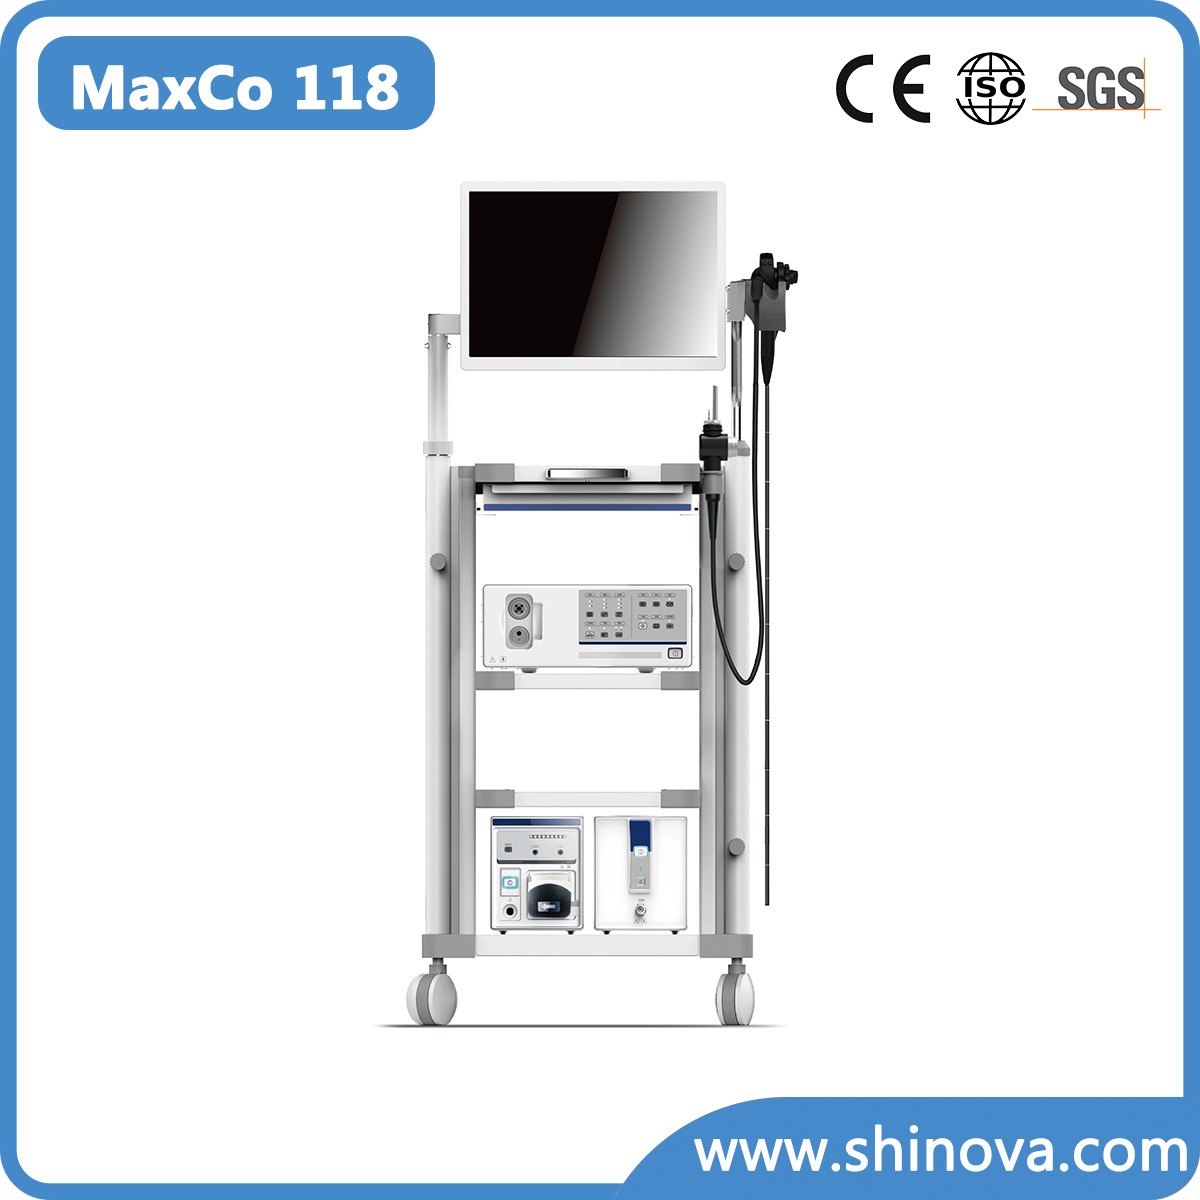 Video Colonoscope Endoscope (Maxco 118)